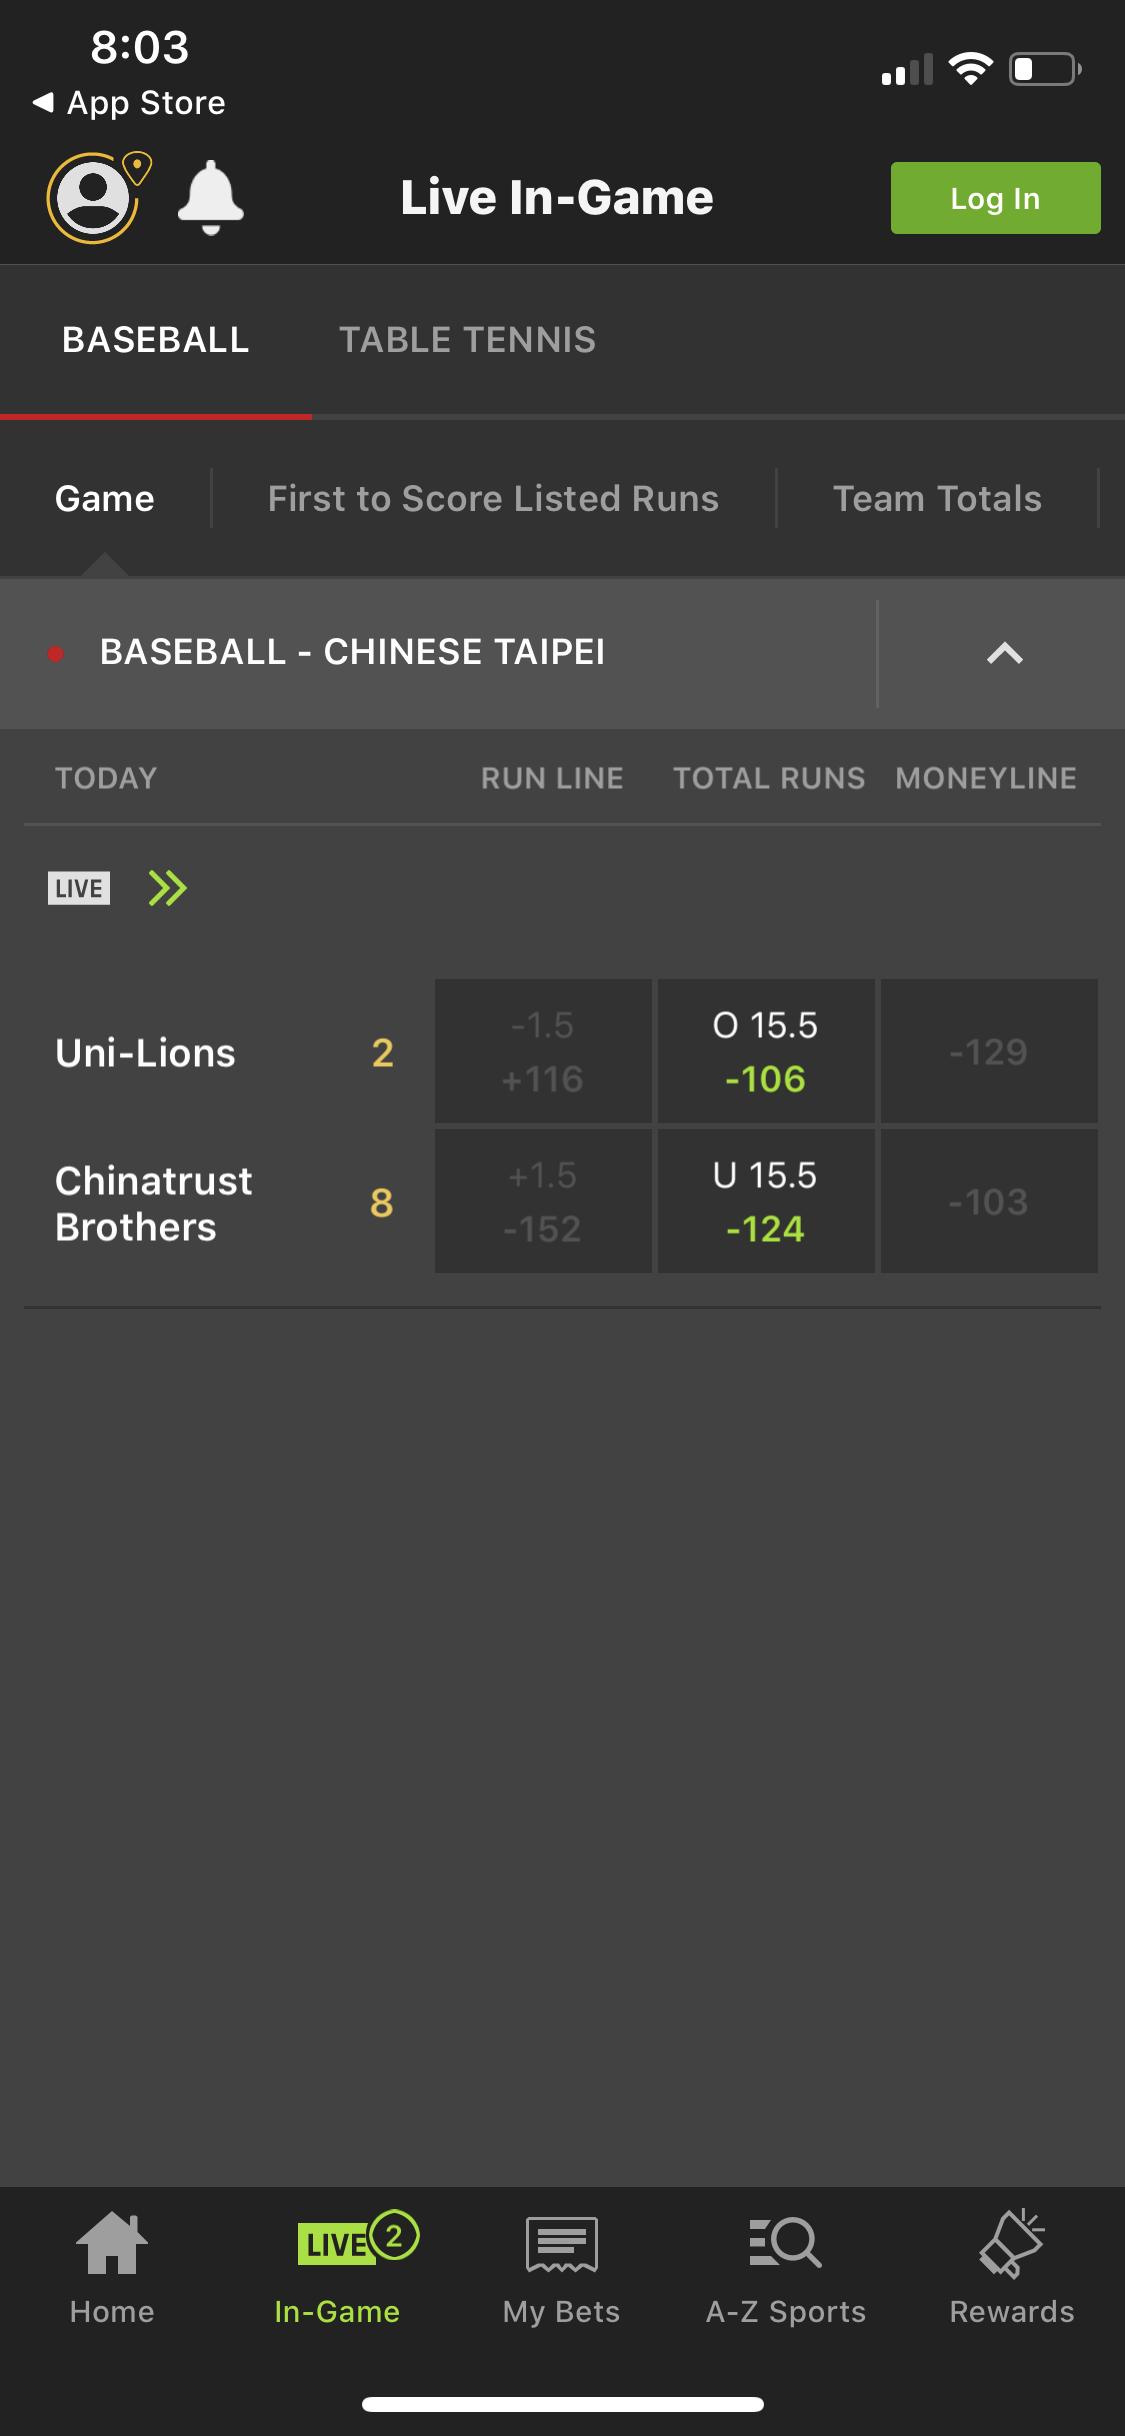 DraftKings Sportsbook App Live Betting